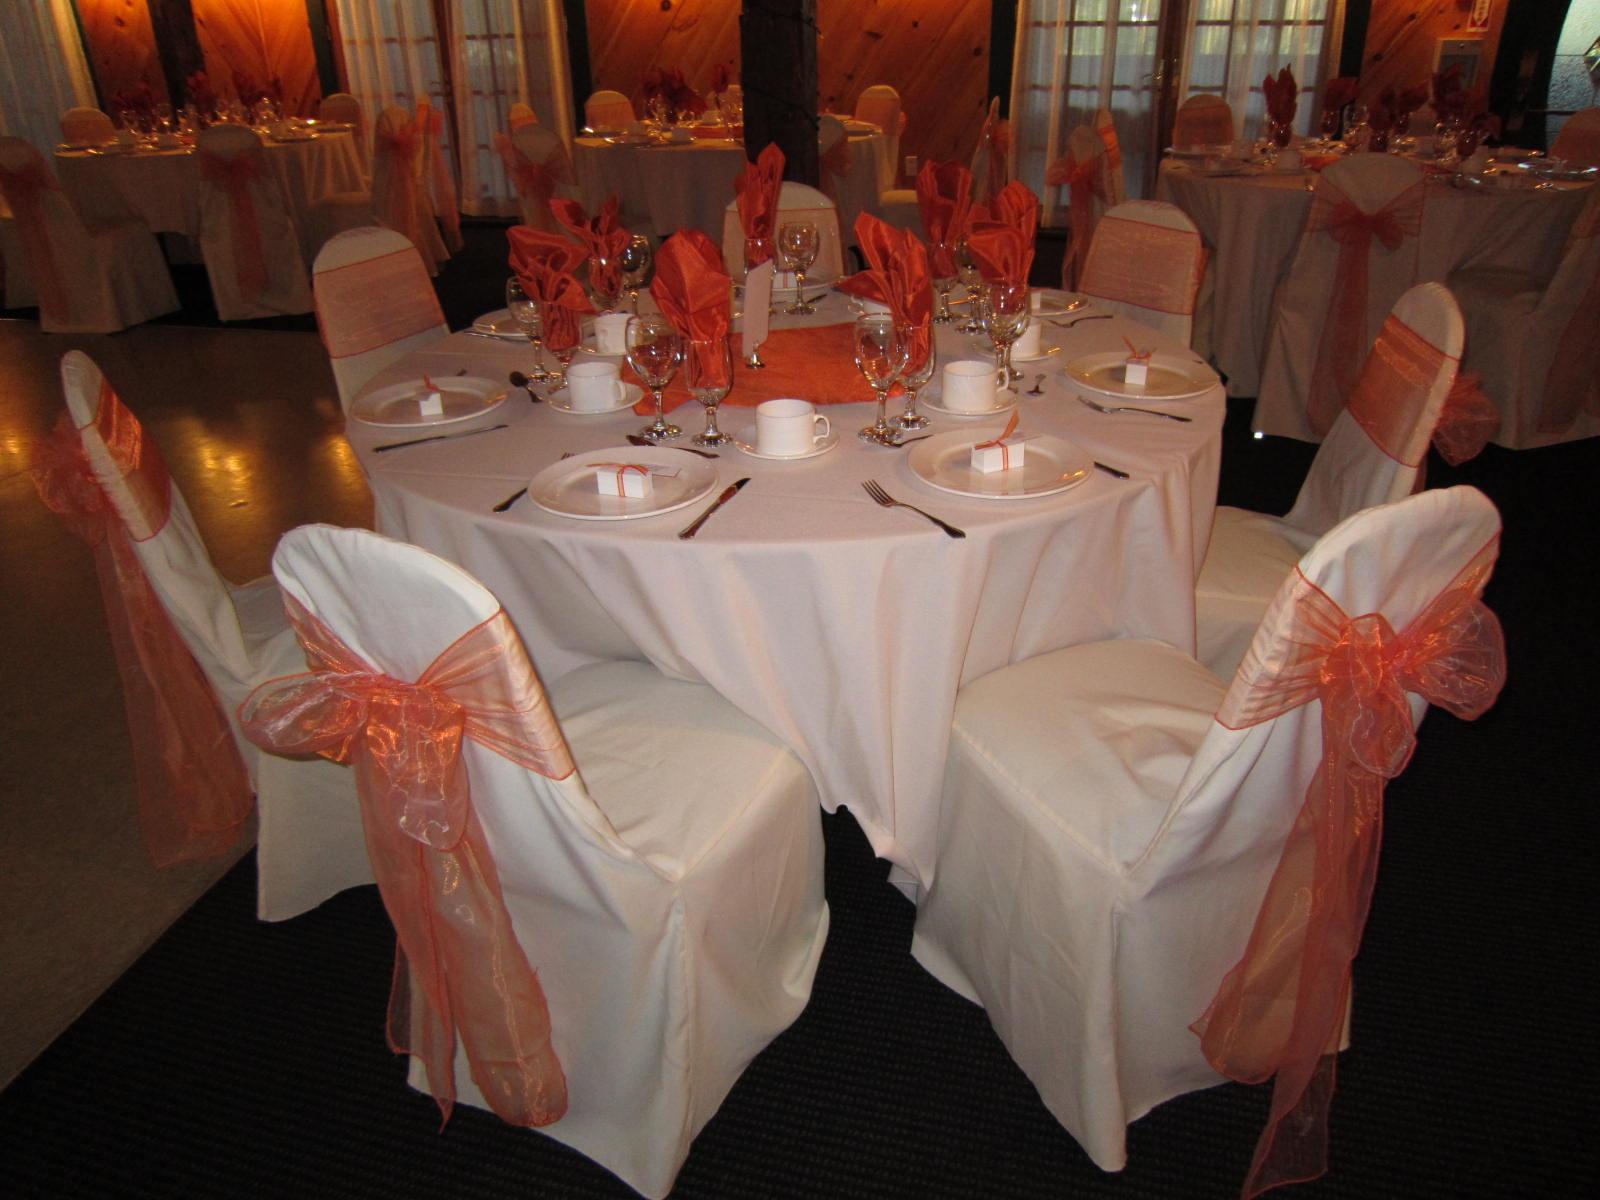 Fall Wedding Decorations Set The Mood Decor